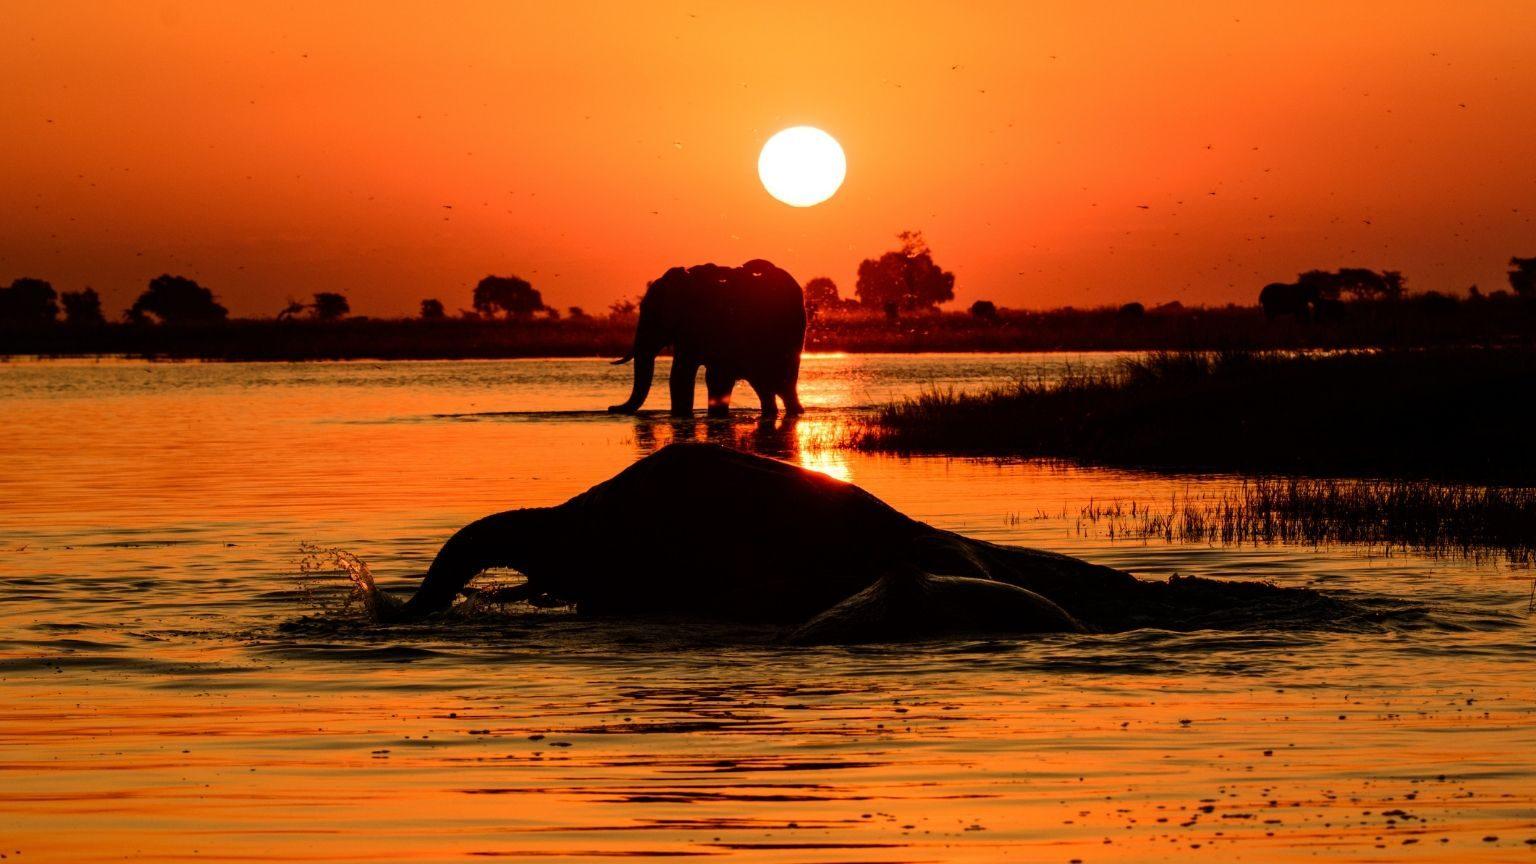 Elephant in Chobe River in Botswana during sunset